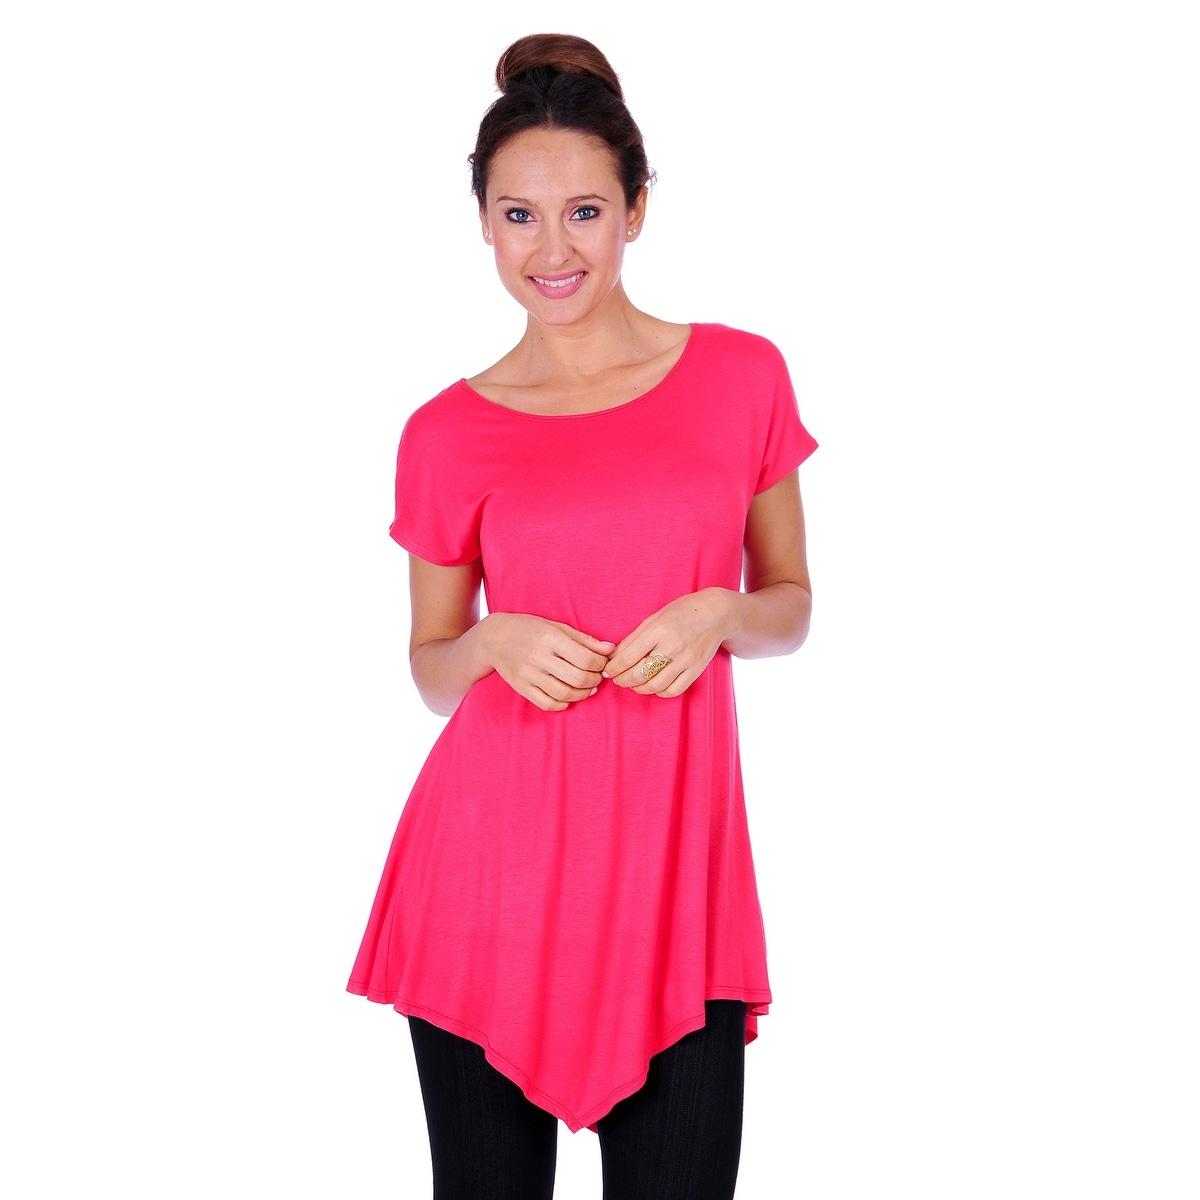 Simply Ravishing Women's Assymetrical Front/Back Handkerchief Hem Sleeveless Tunic Top - Thumbnail 14